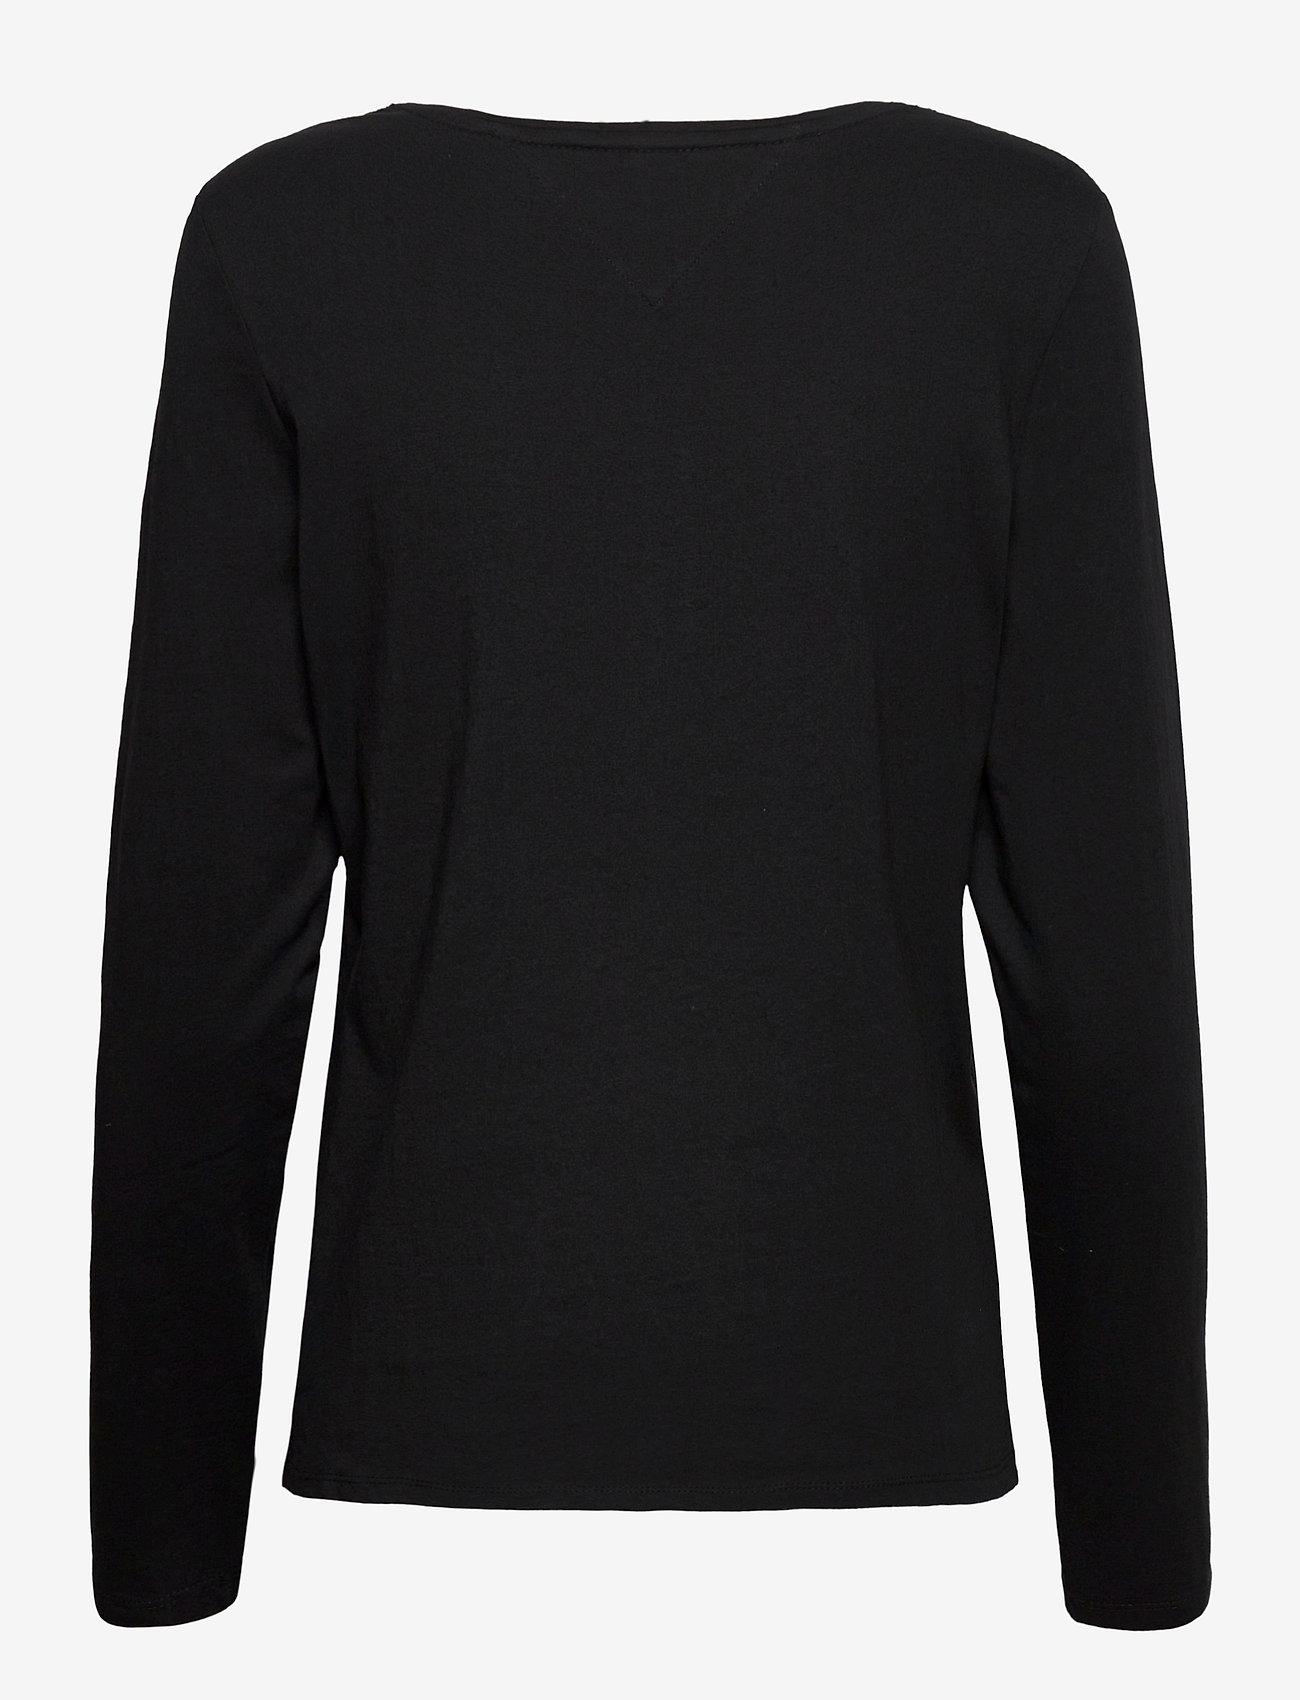 Tommy Jeans - TJW JERSEY V NECK LONGSLEEVE - long-sleeved tops - black - 1